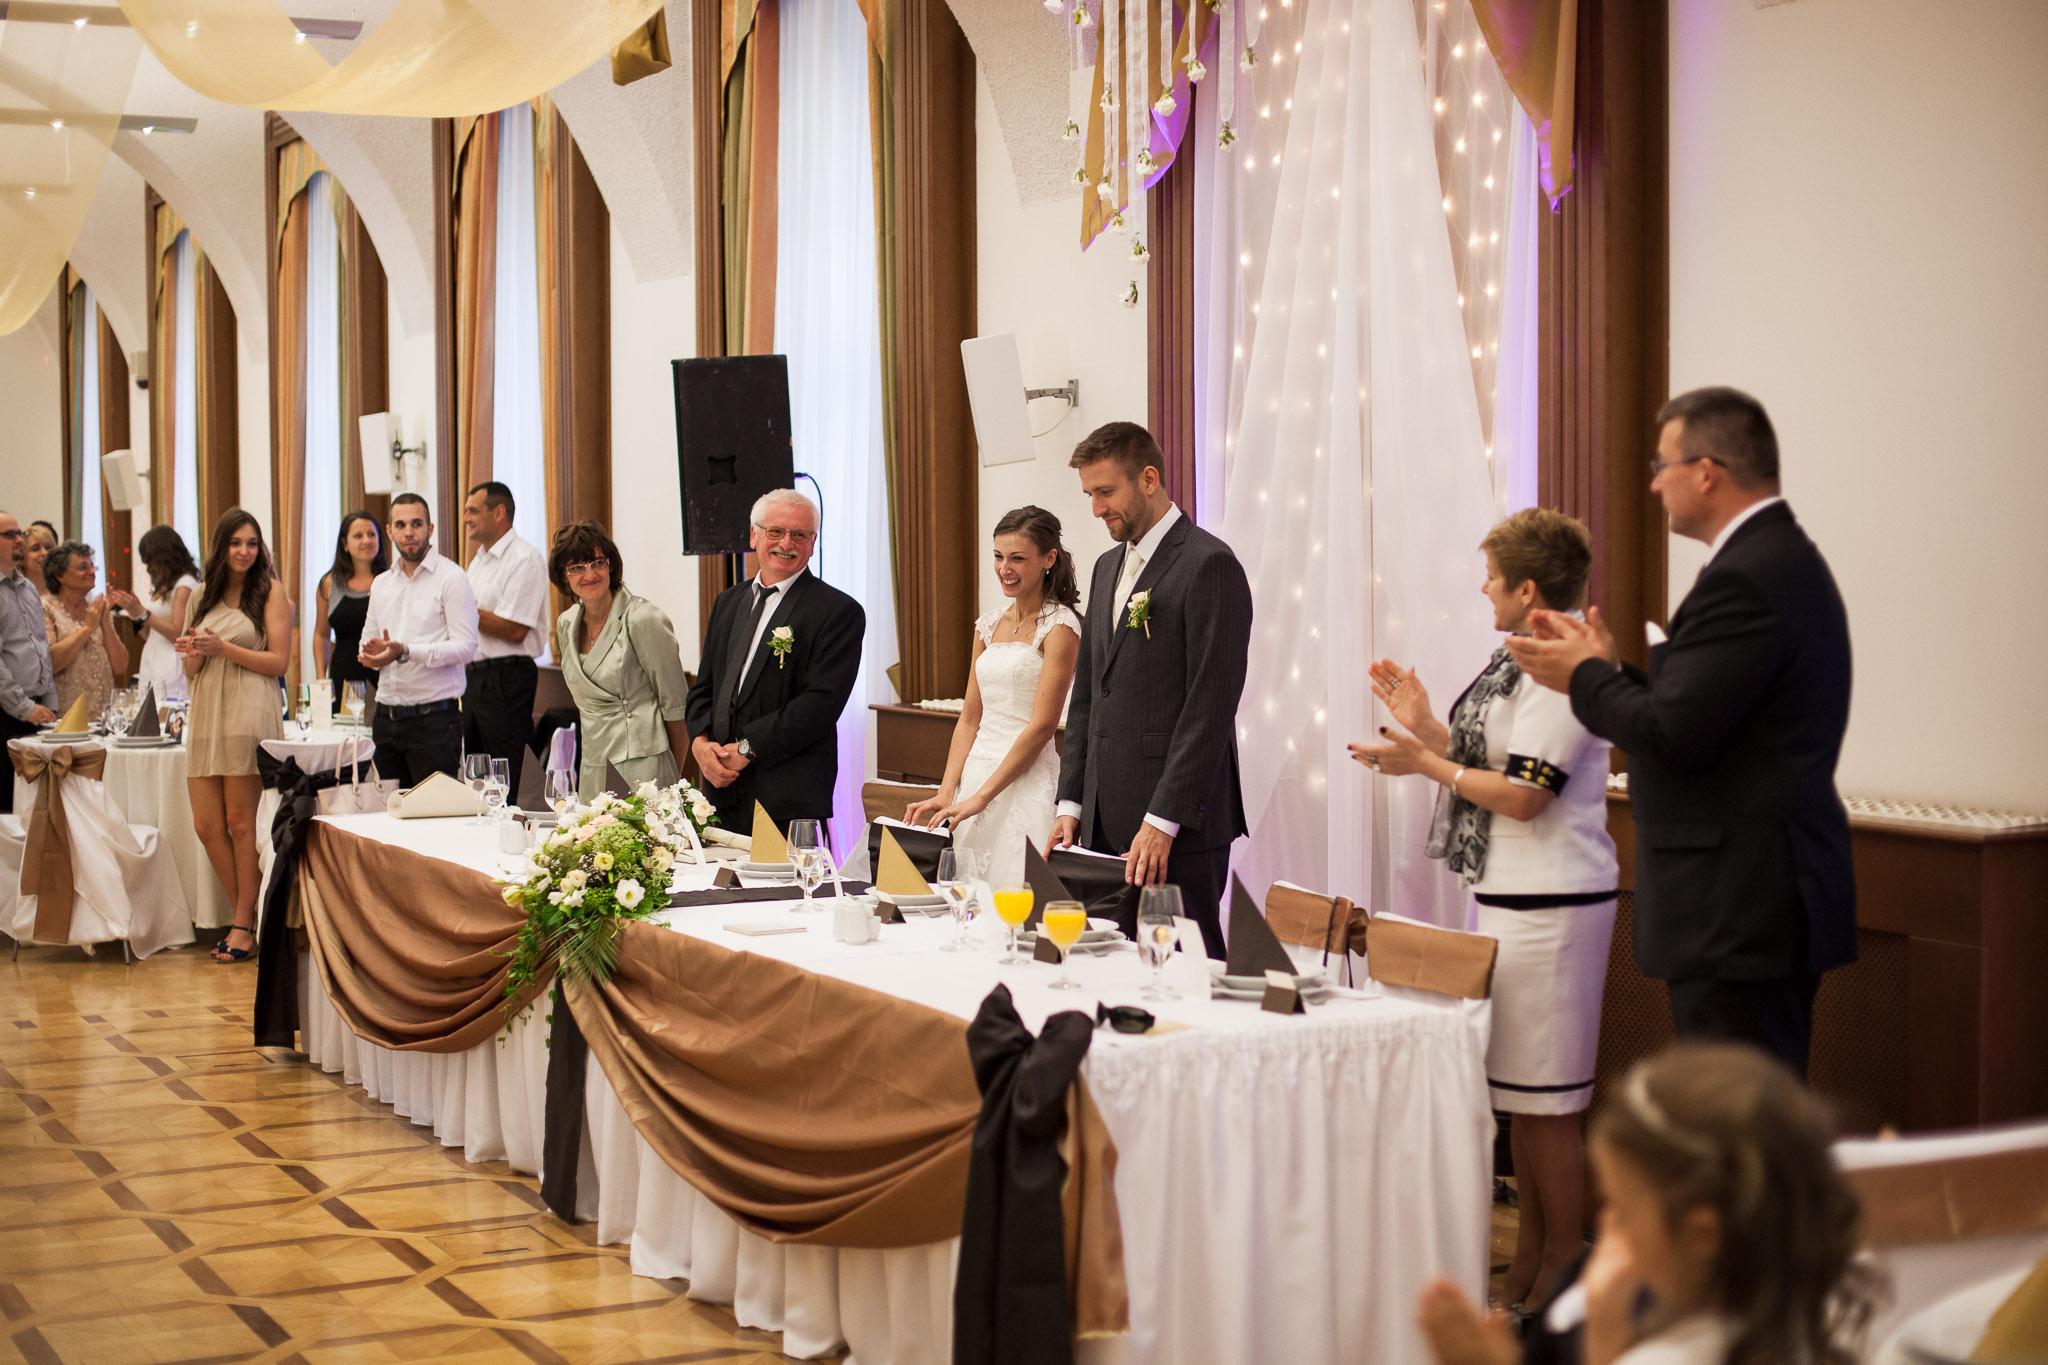 eskuvo_fotozas_wedding_foto_lenart_gabor_sztyui_budapest_esztergom_IMG_5284